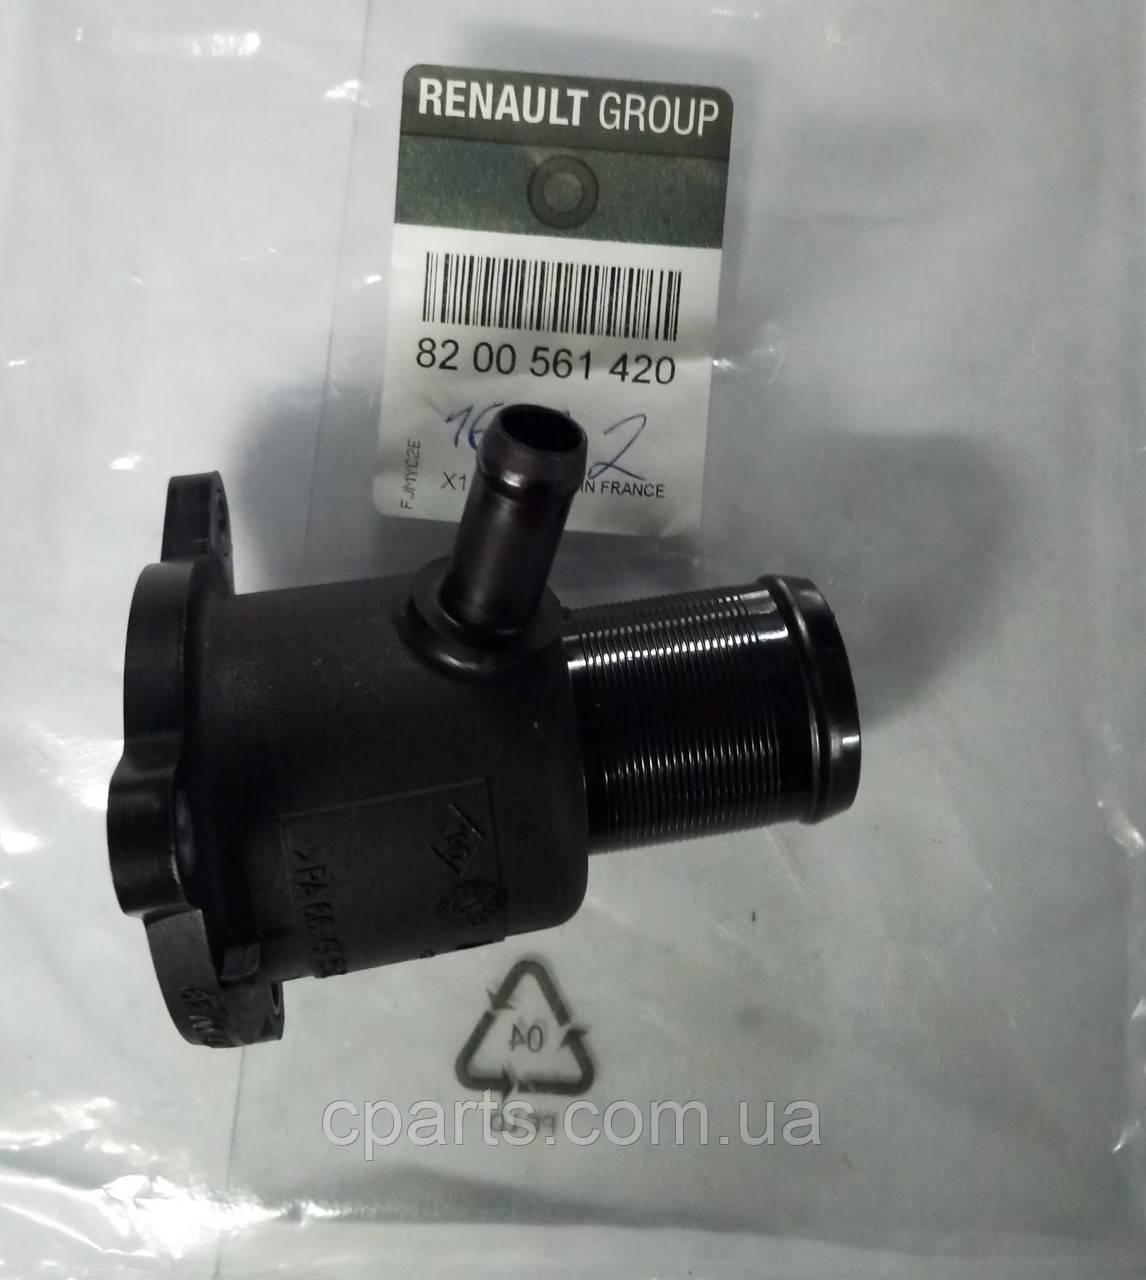 Корпус термостата Renault Sandero (оригинал)